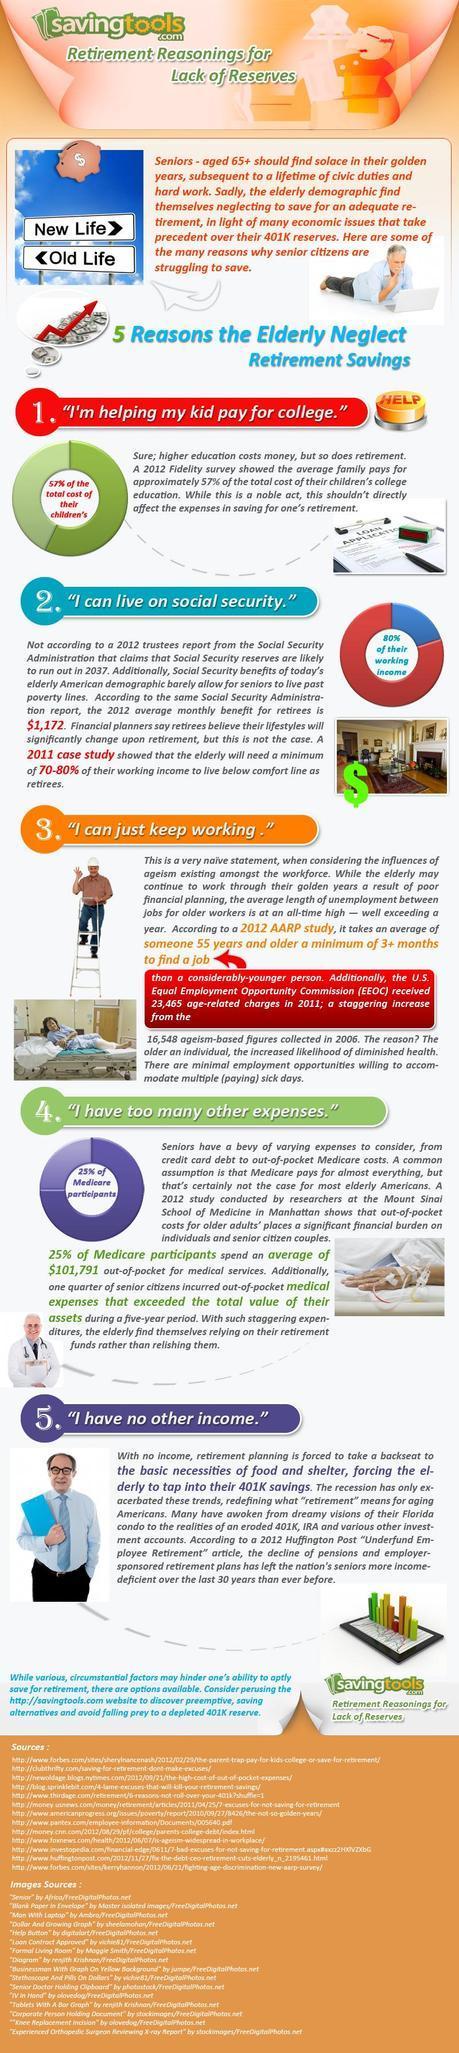 5 Reasons Seniors Neglect Their Retirement Savings Infographic